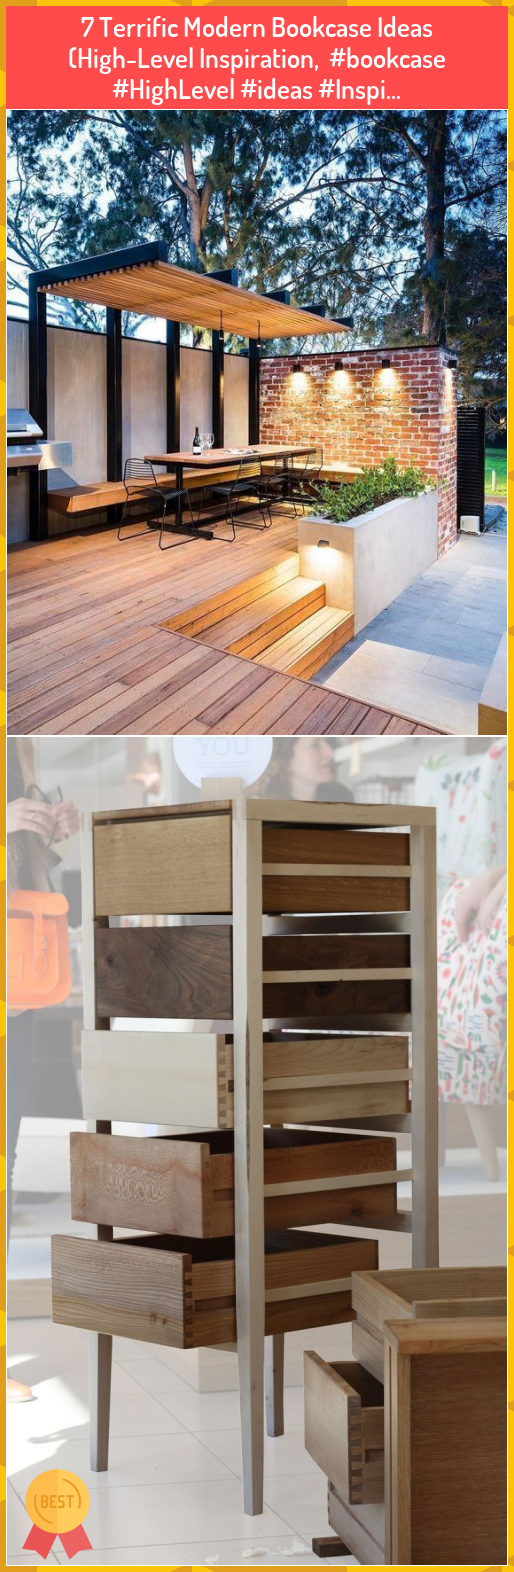 7 Terrific Modern Bookcase Ideas (High-Level Inspiration,  #bookcase #HighLevel #ideas #Inspi... #Terrific #Modern #Bookcase #Ideas #(High-Level #Inspiration, ##bookcase ##HighLevel ##ideas ##Inspi...